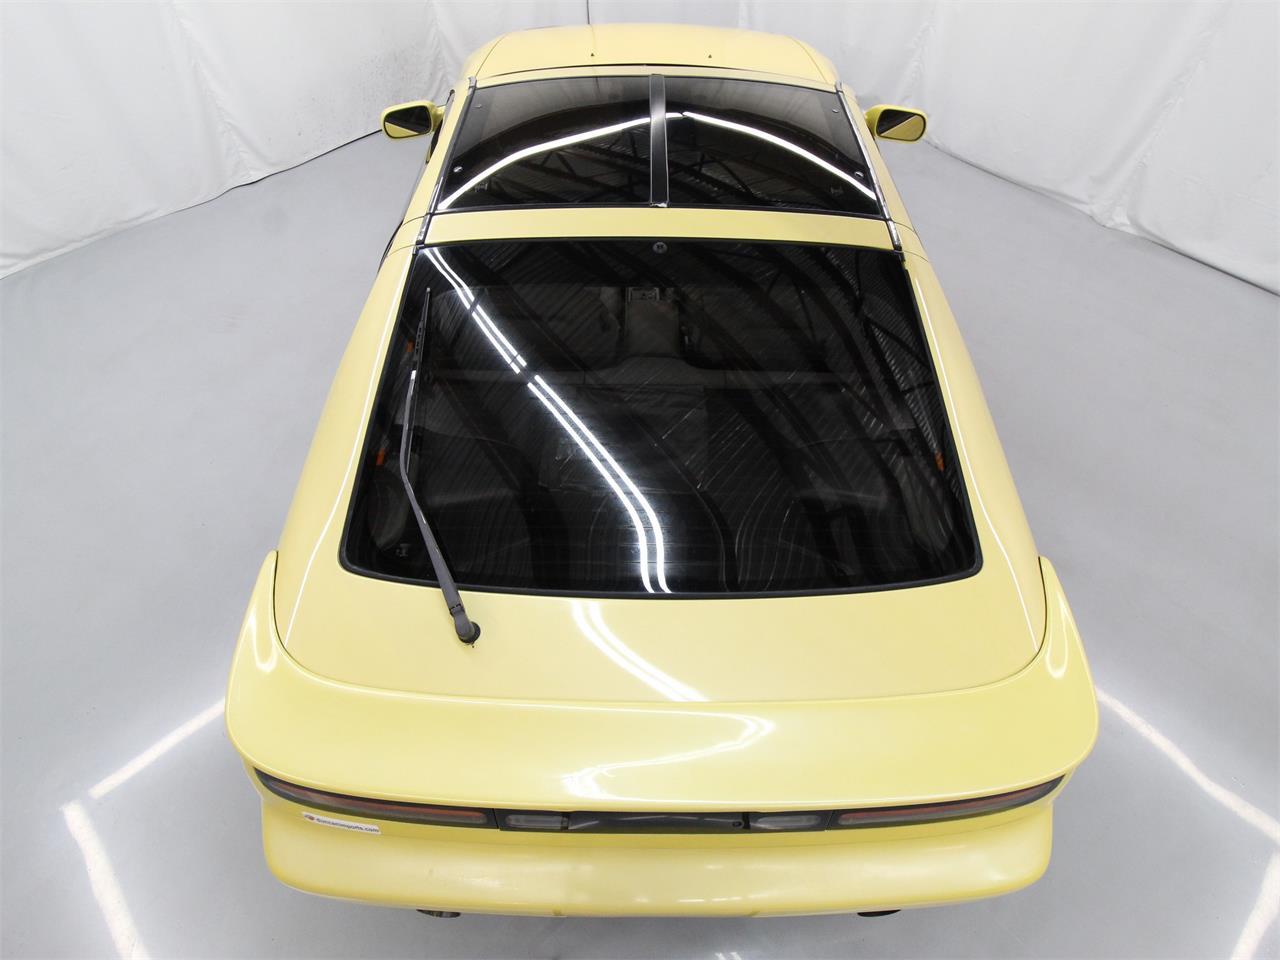 1989 Nissan Fairlady (CC-1276369) for sale in Christiansburg, Virginia